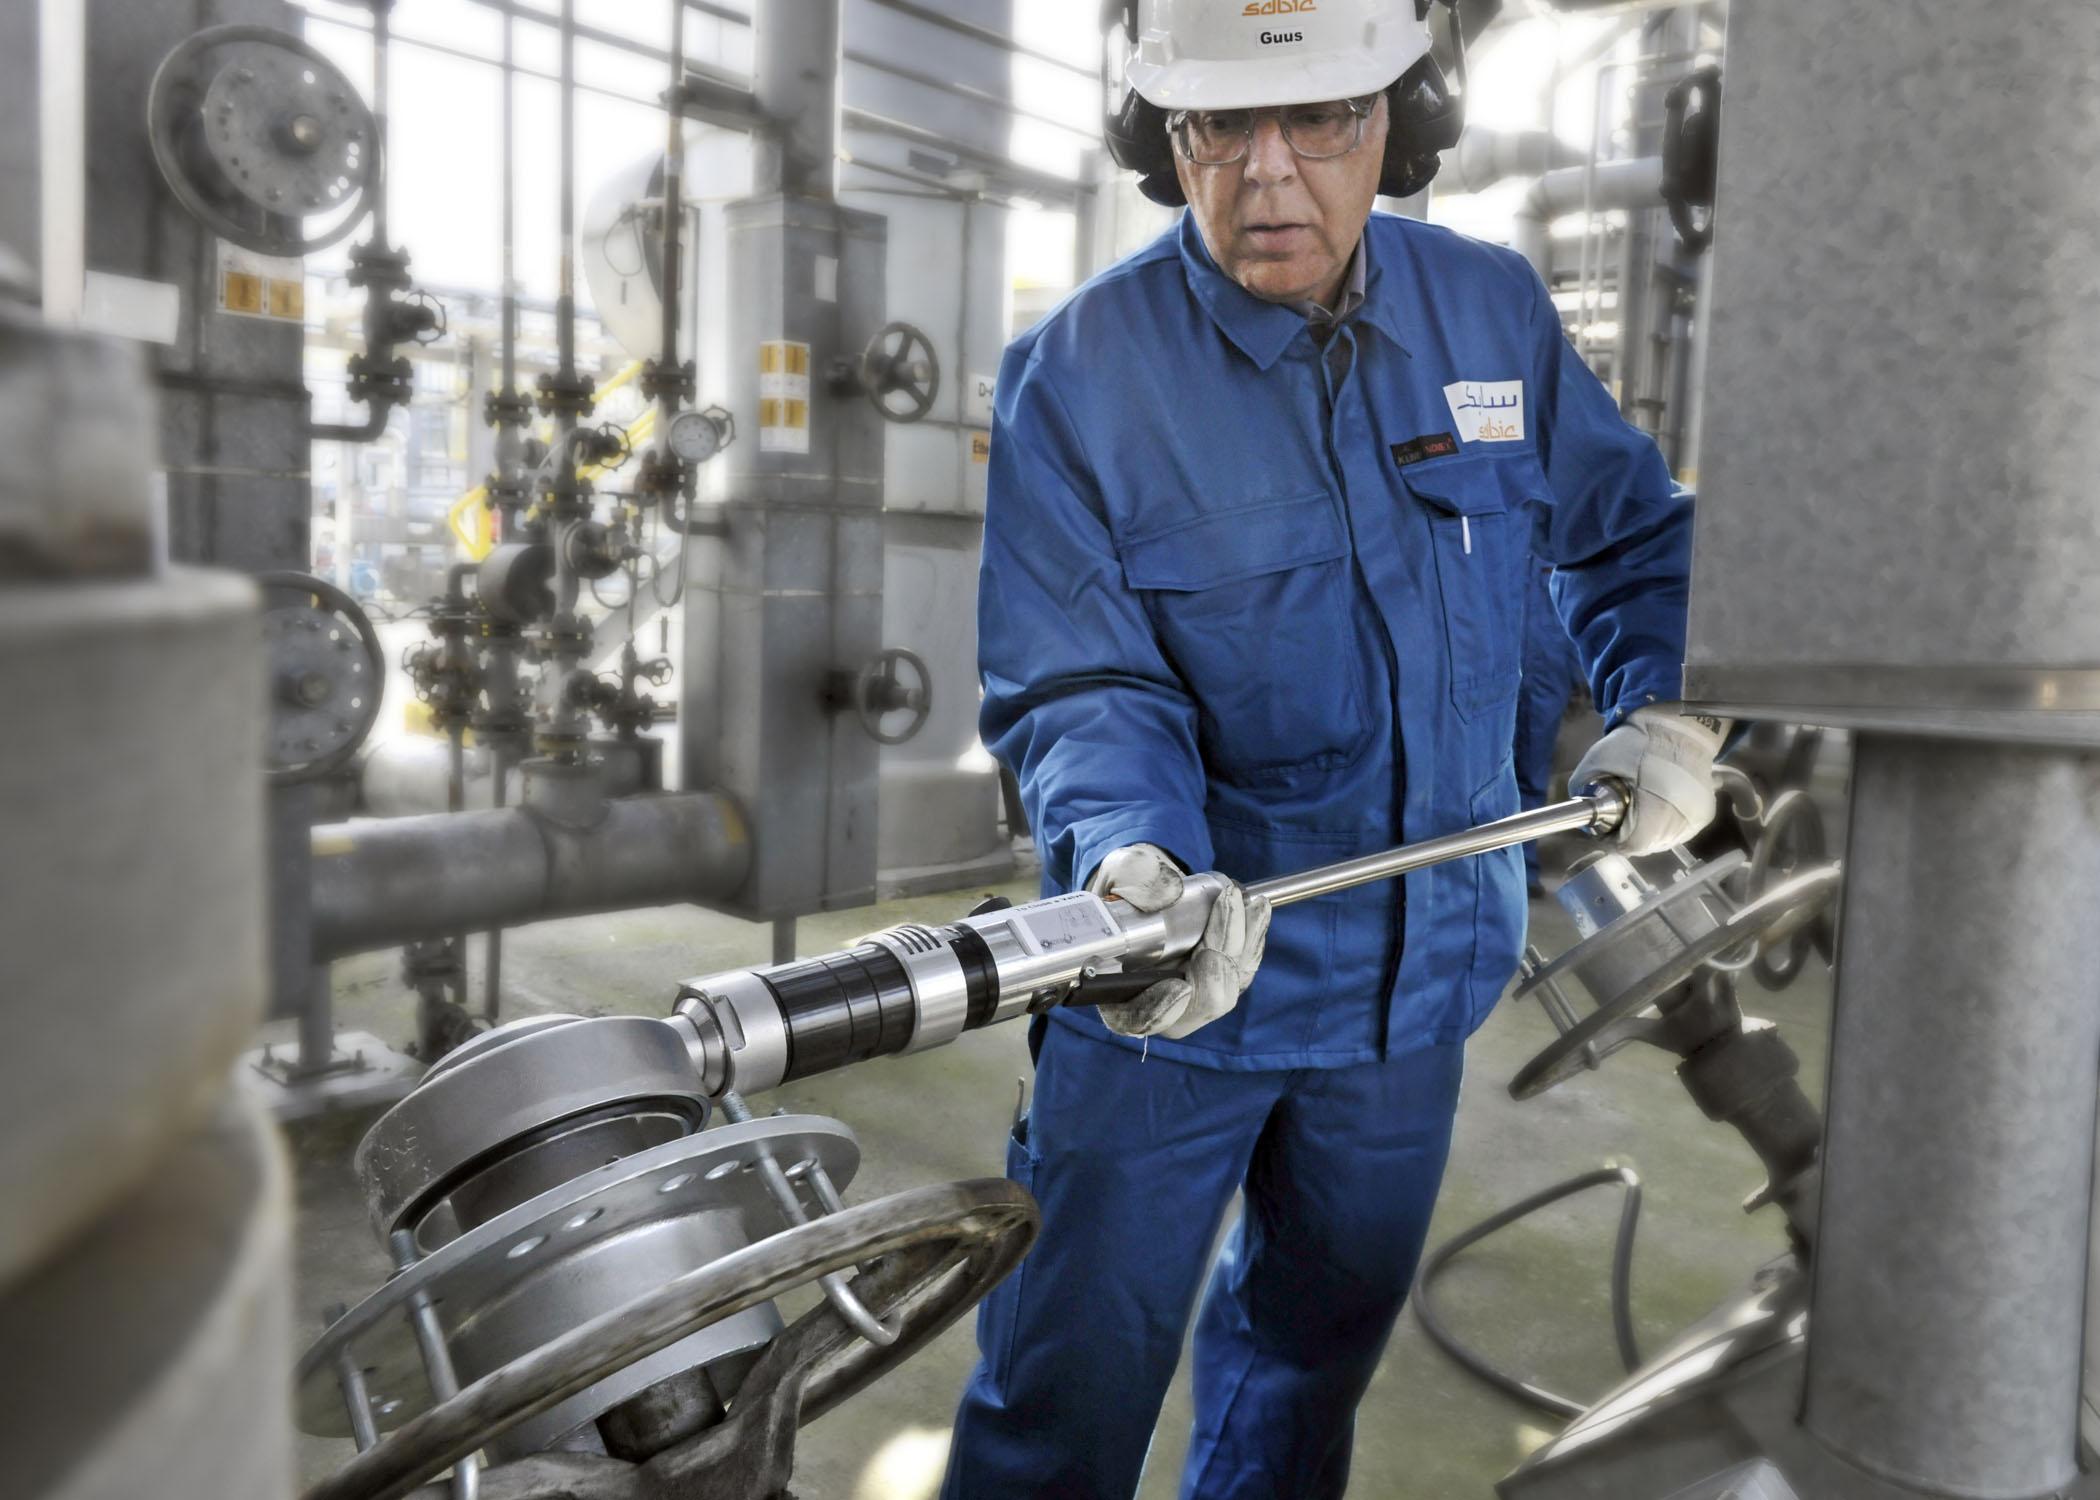 Organizational safety culture assessment. - Sabic - Saudia Arabian Affiliates